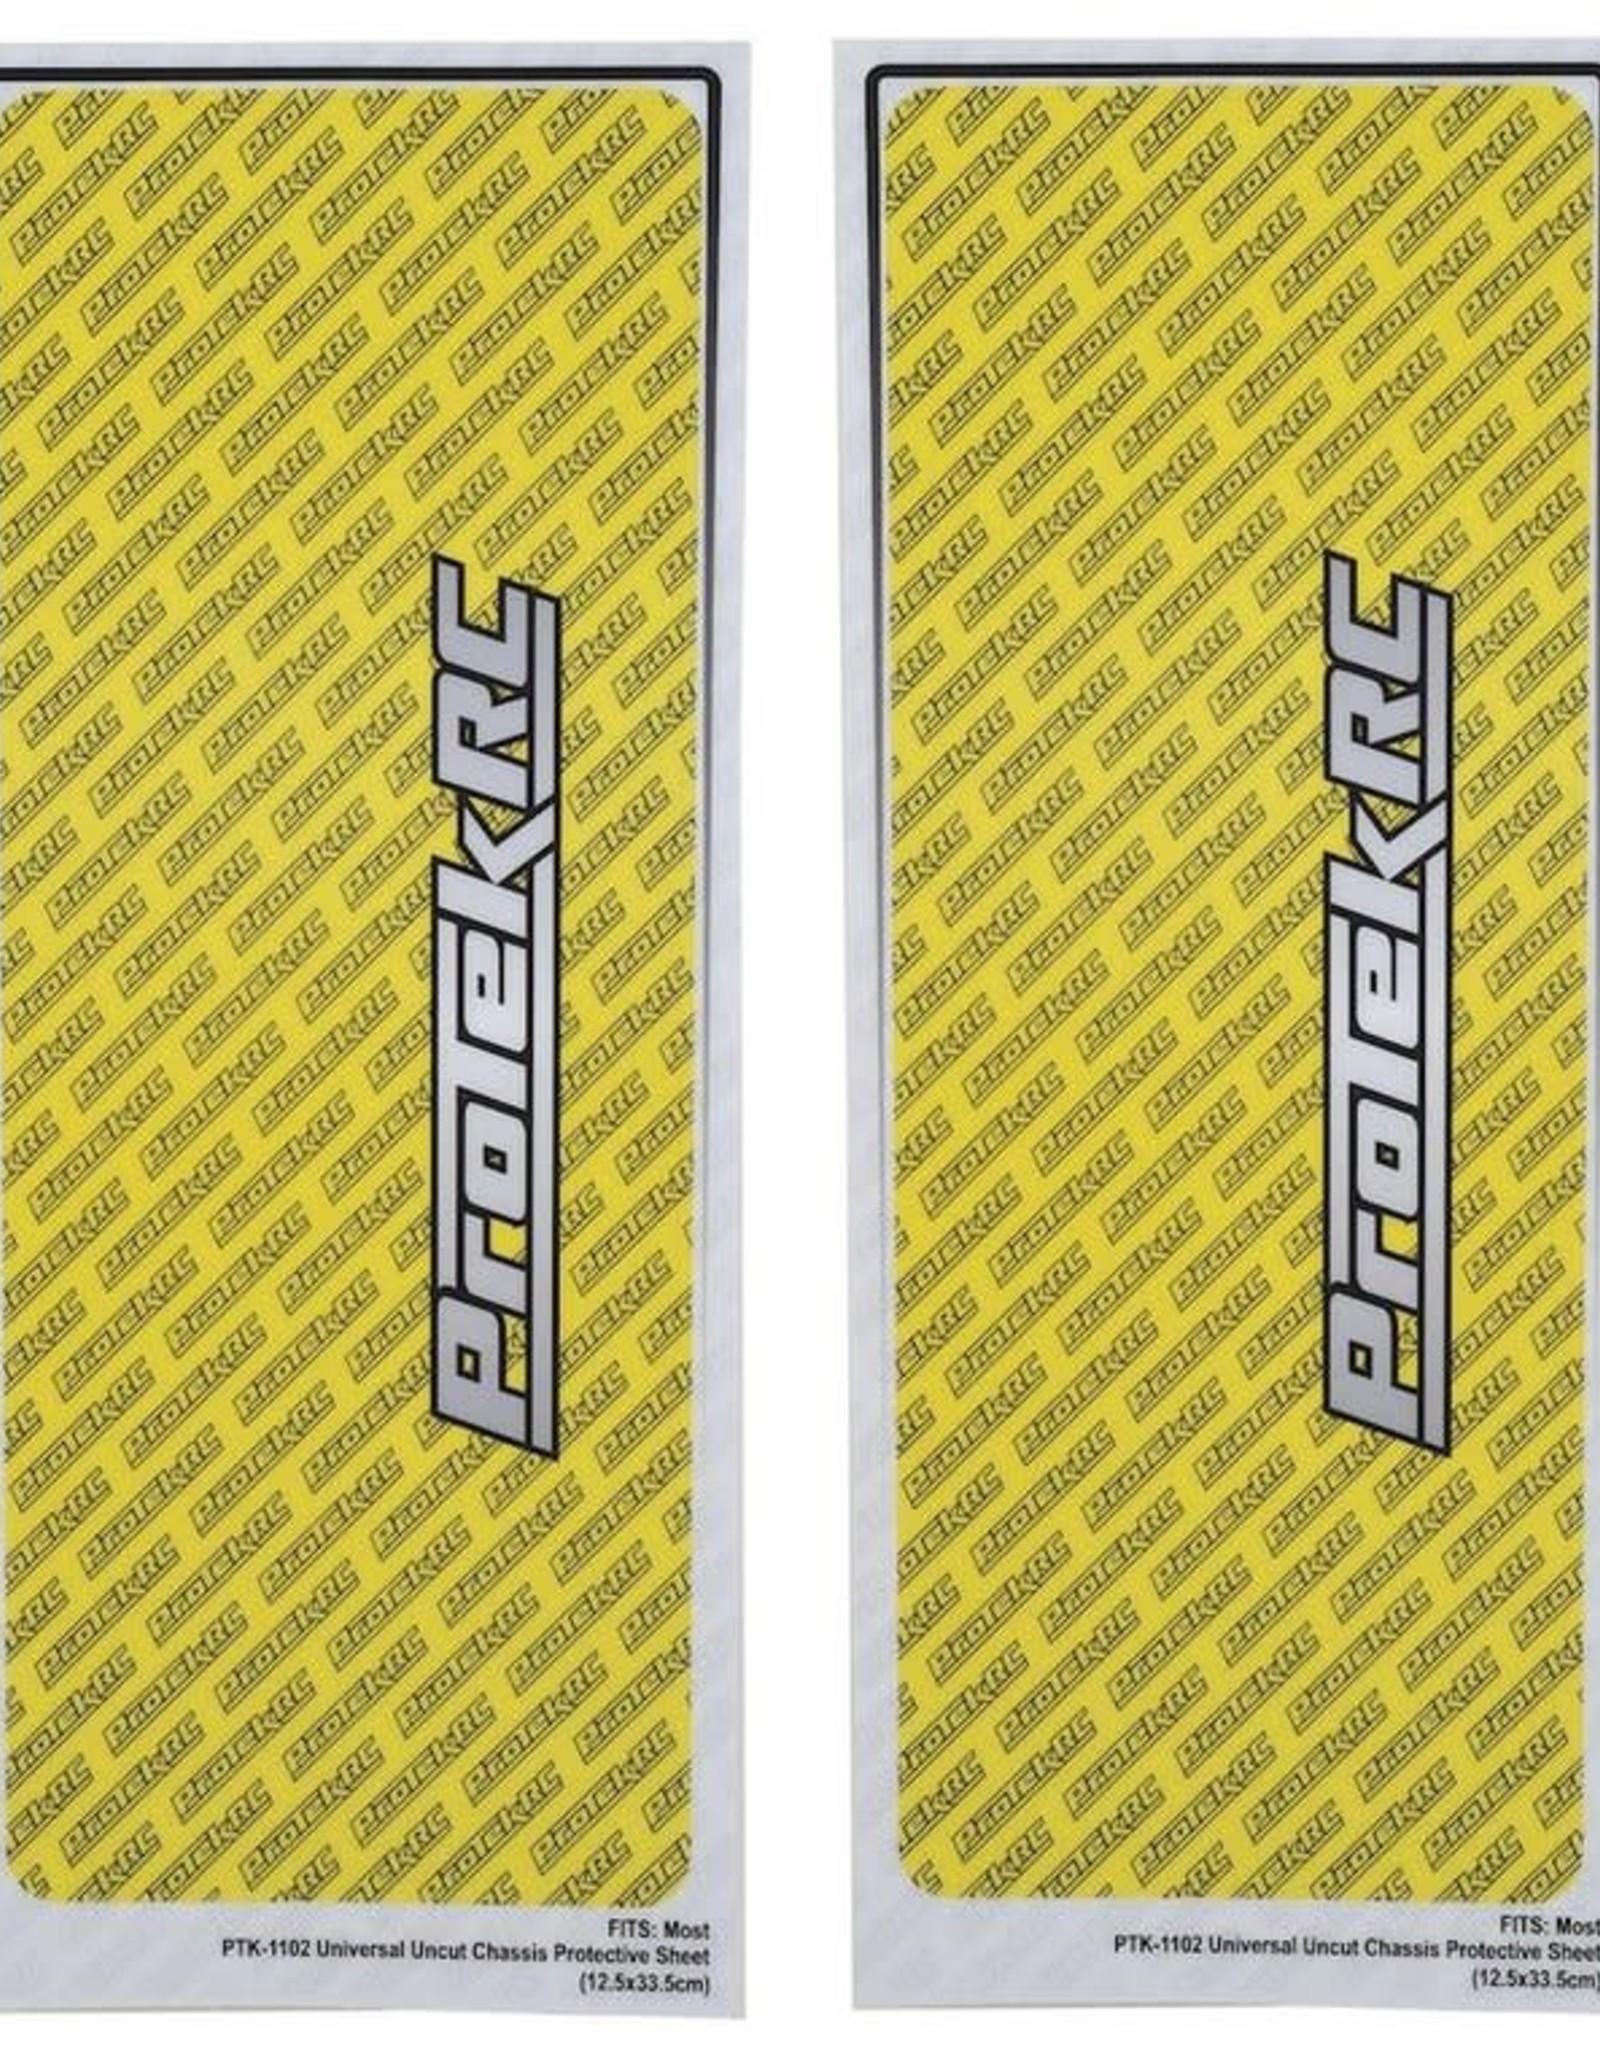 Protek RC ProTek RC Universal Chassis Protective Sheet (Yellow) (2) (12.5x33.5cm)